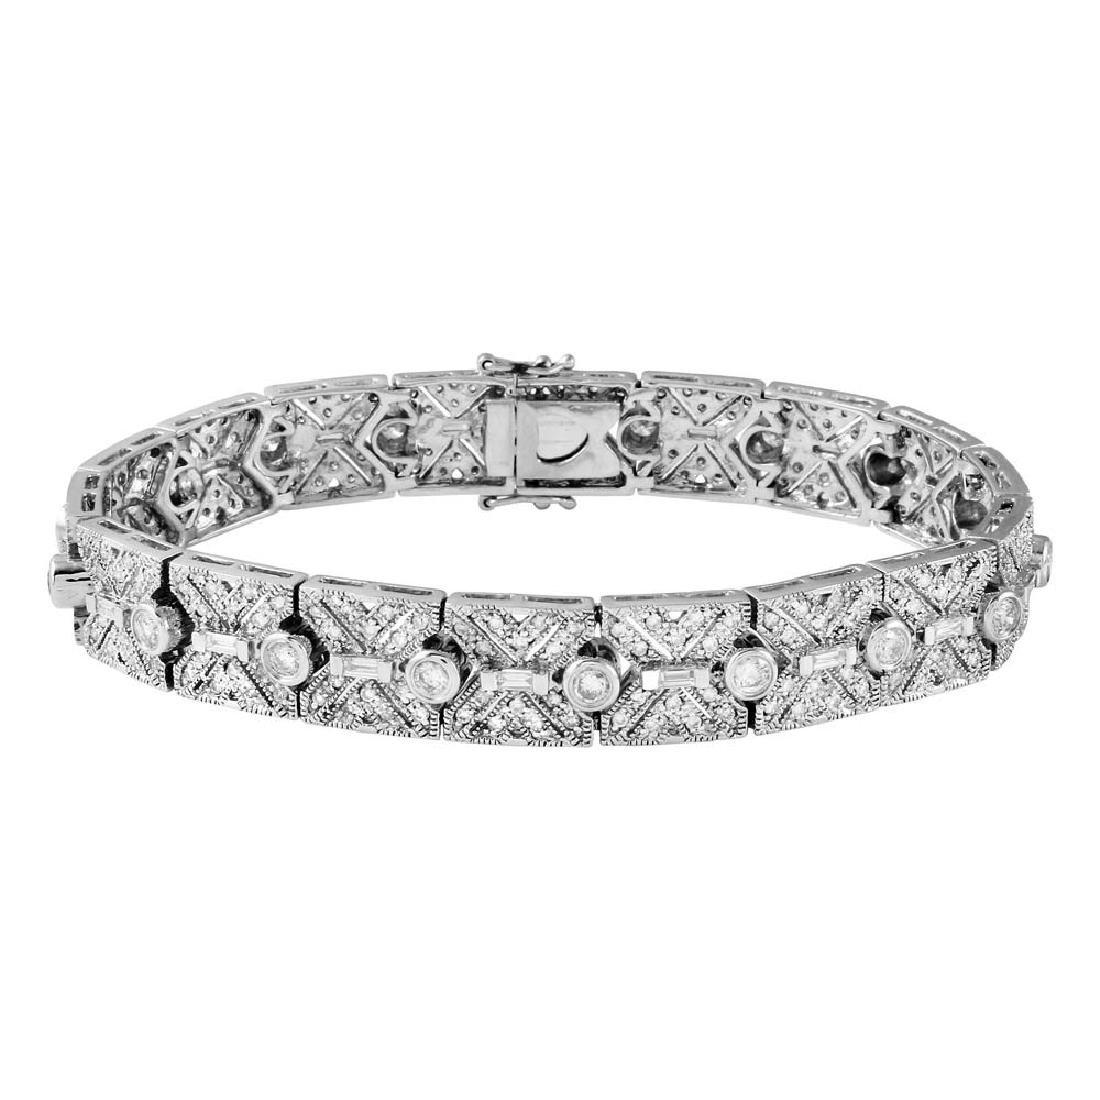 Genuine 3.53 TCW 14K White Gold Ladies Bracelet